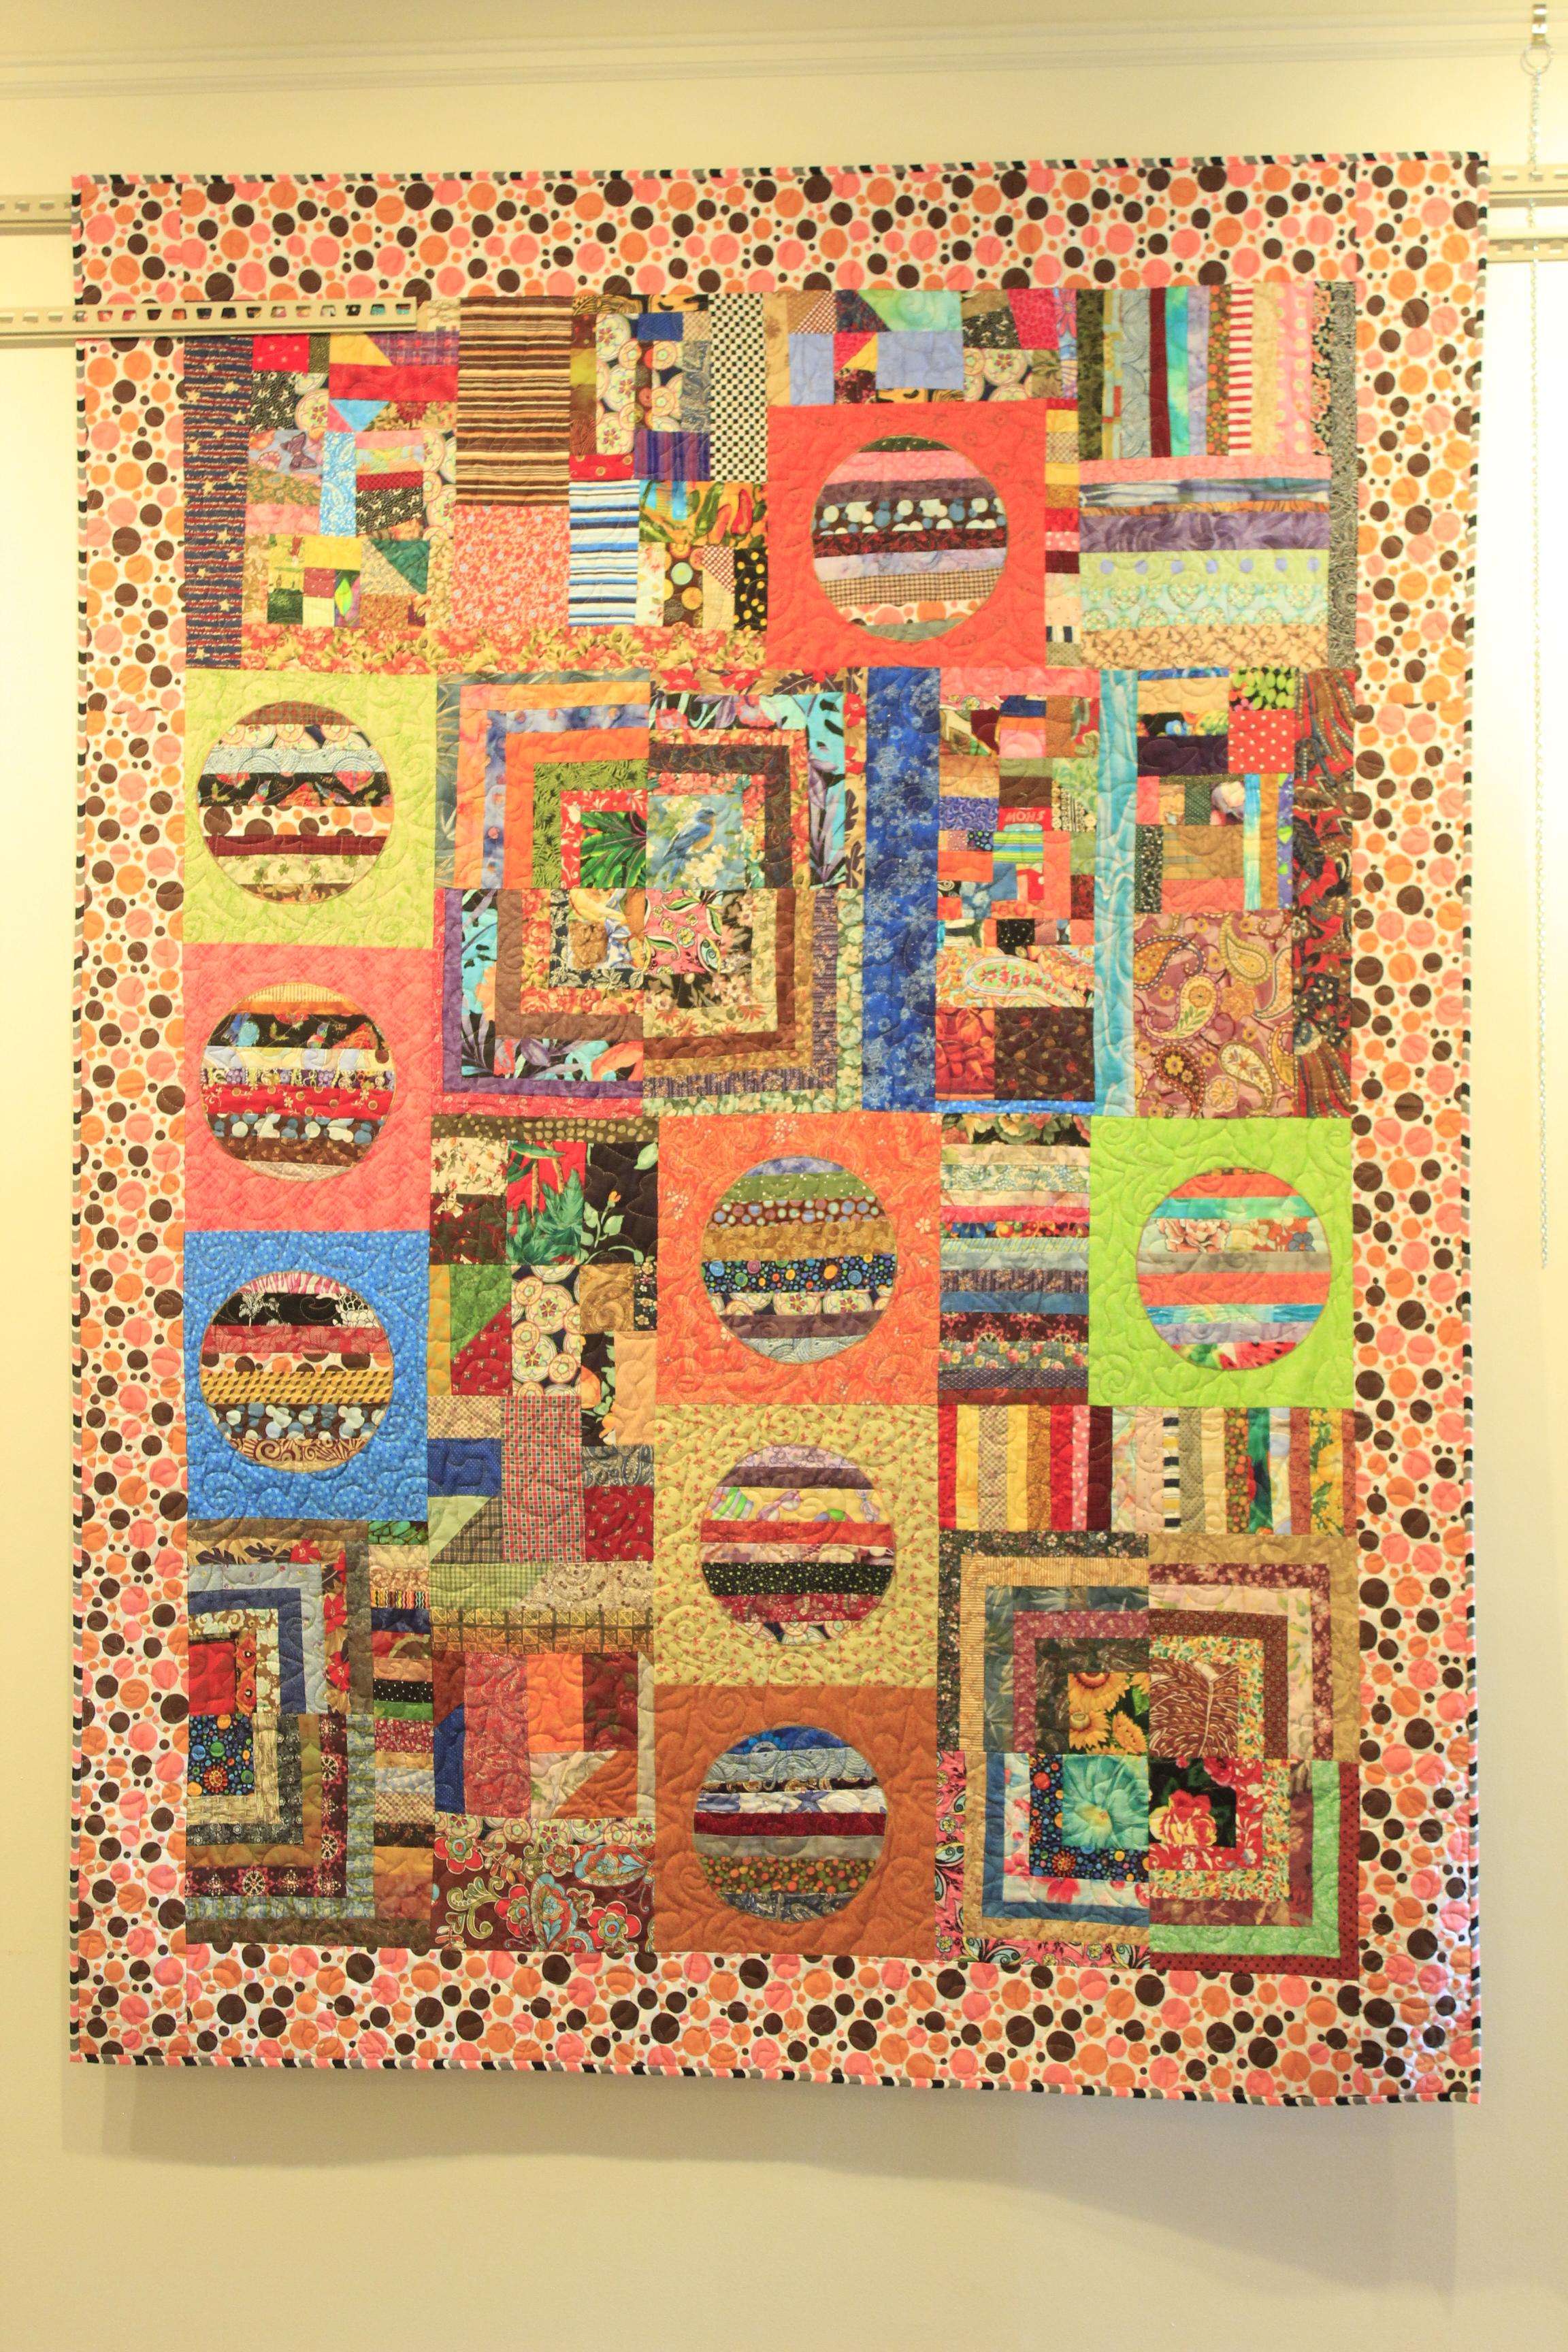 Margarita Blyumkina and her quilt work